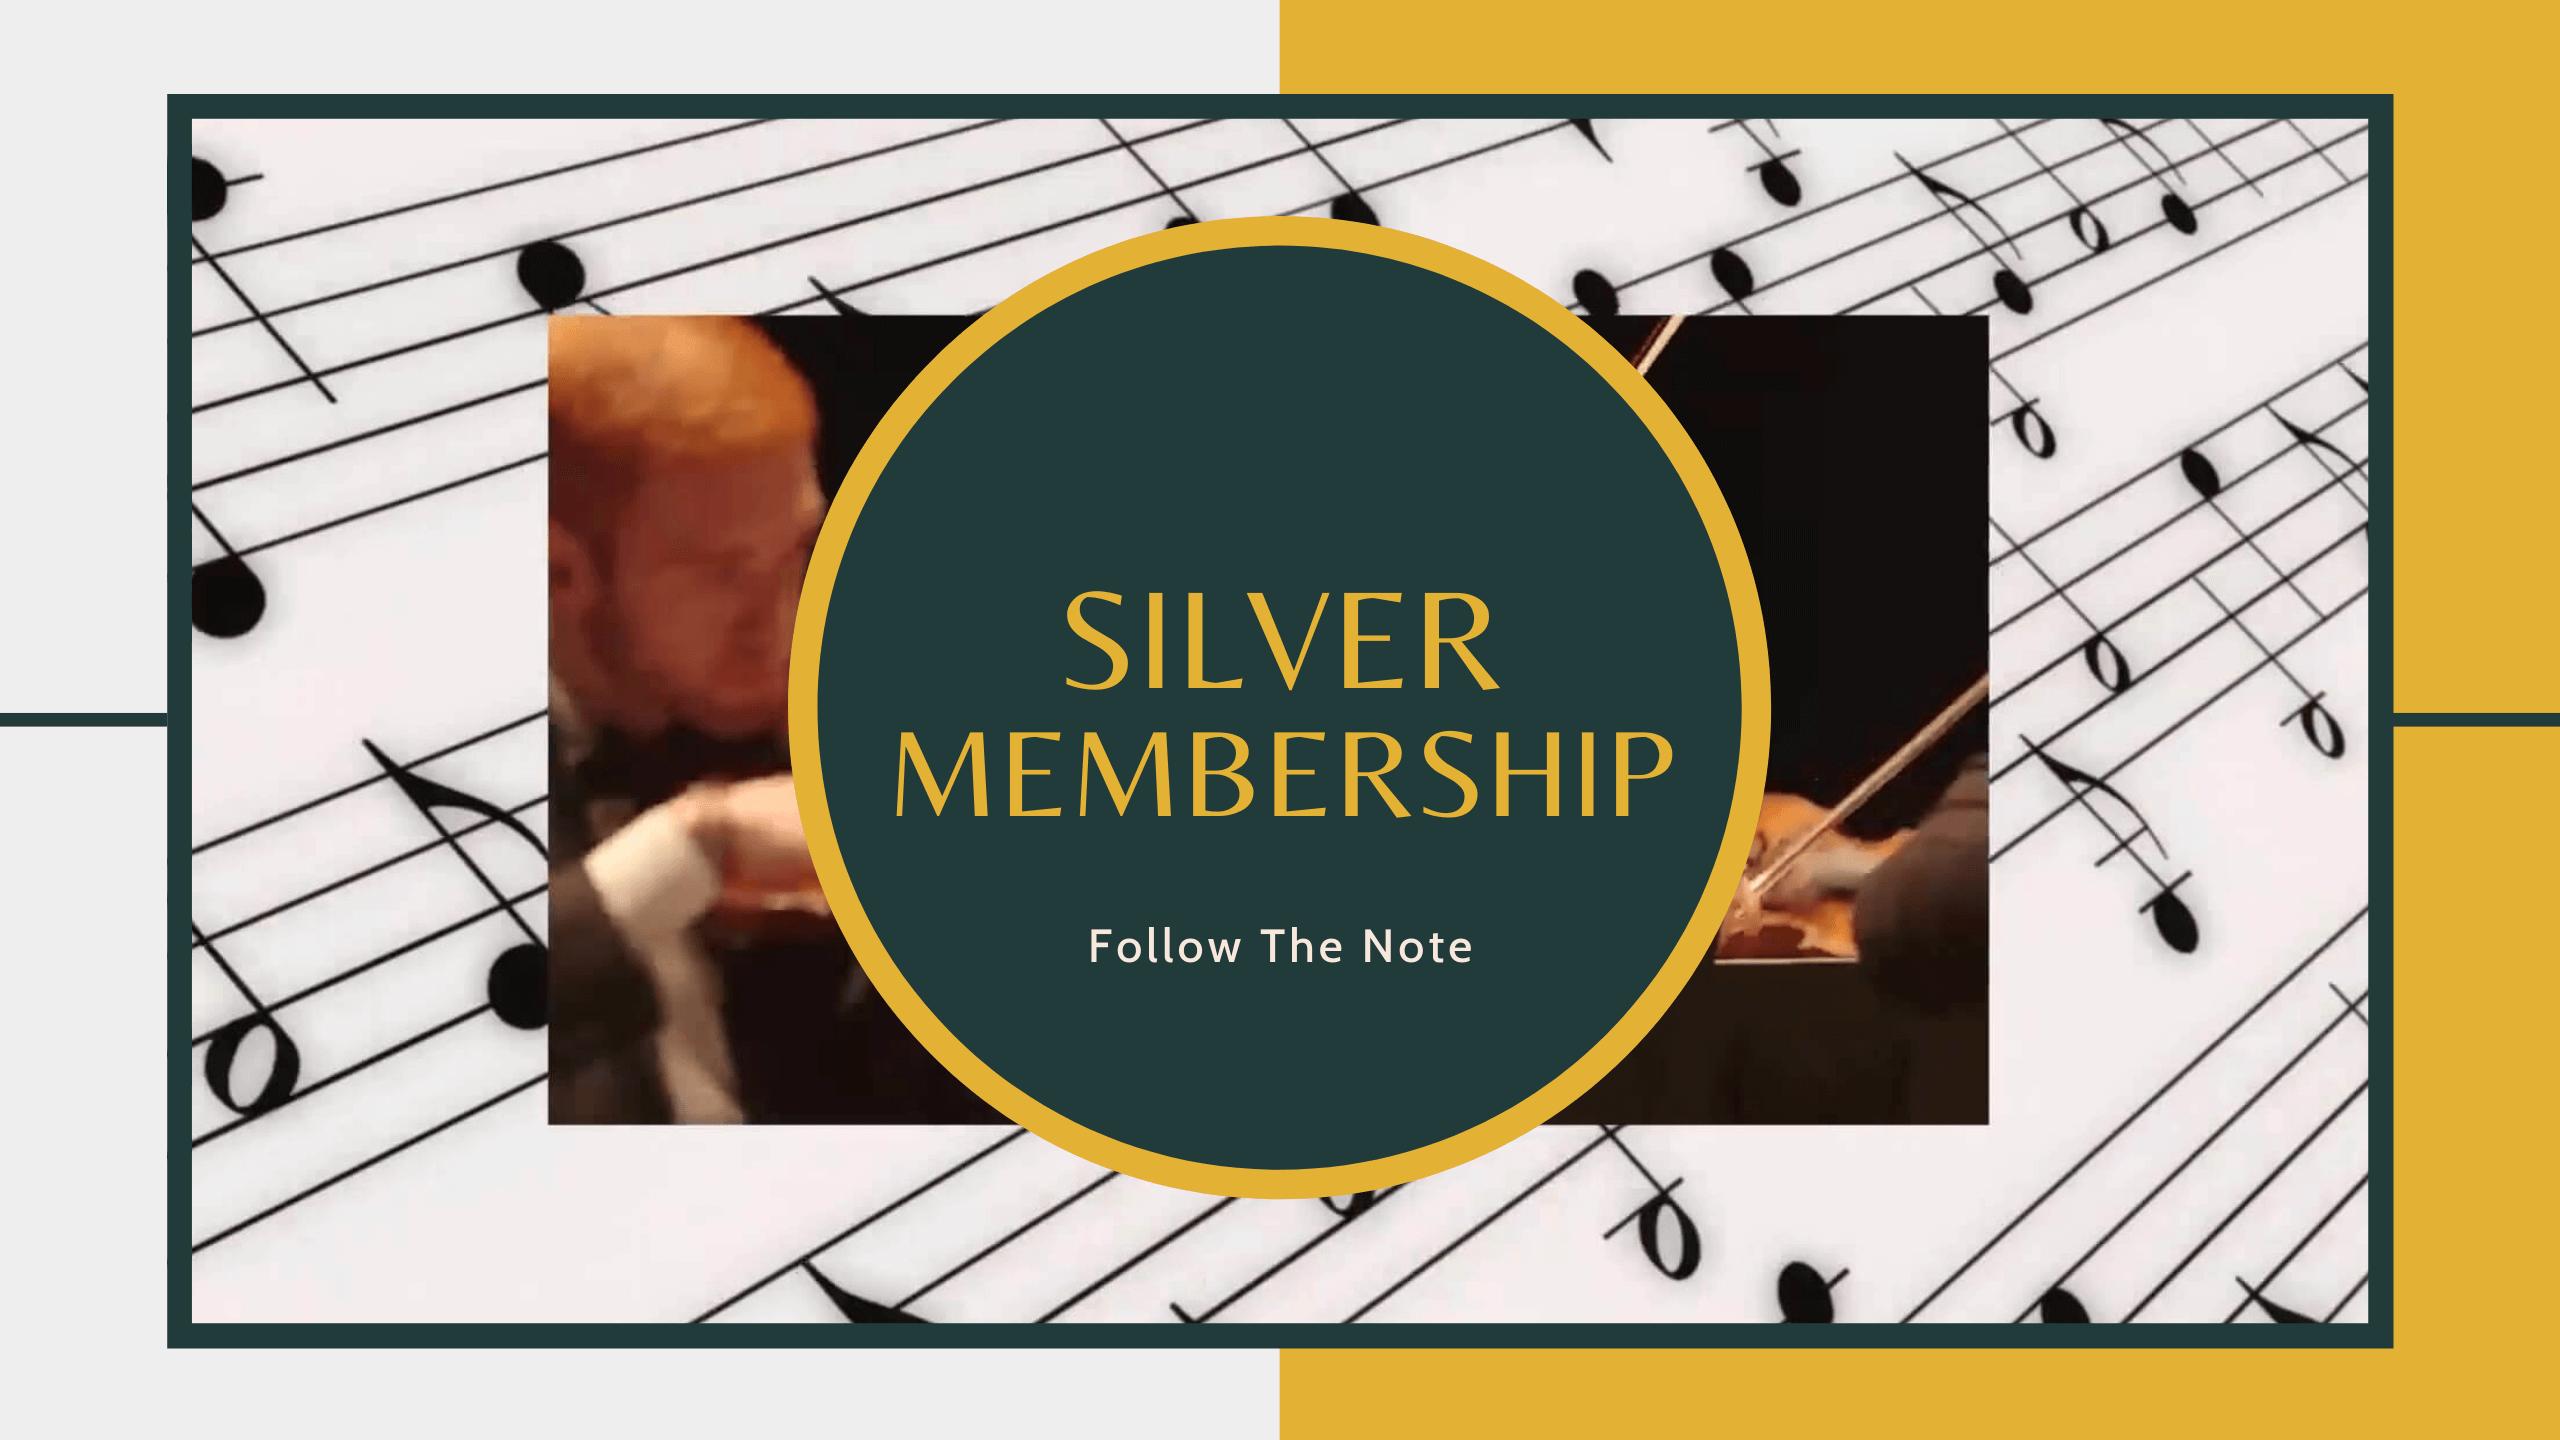 Follow The Note - Silver Membership (1)